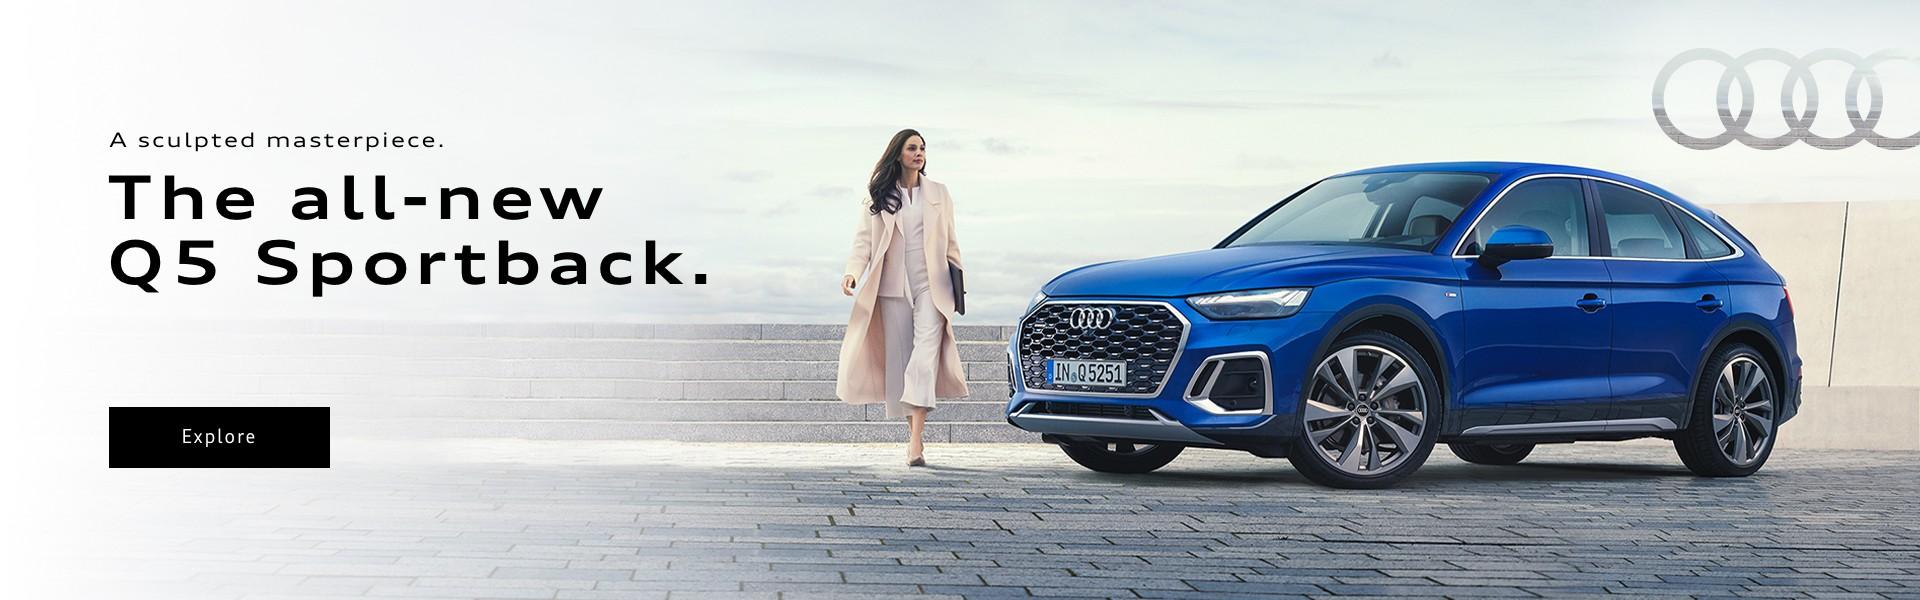 2021 Audi Q5 Sportback Promotional Banner